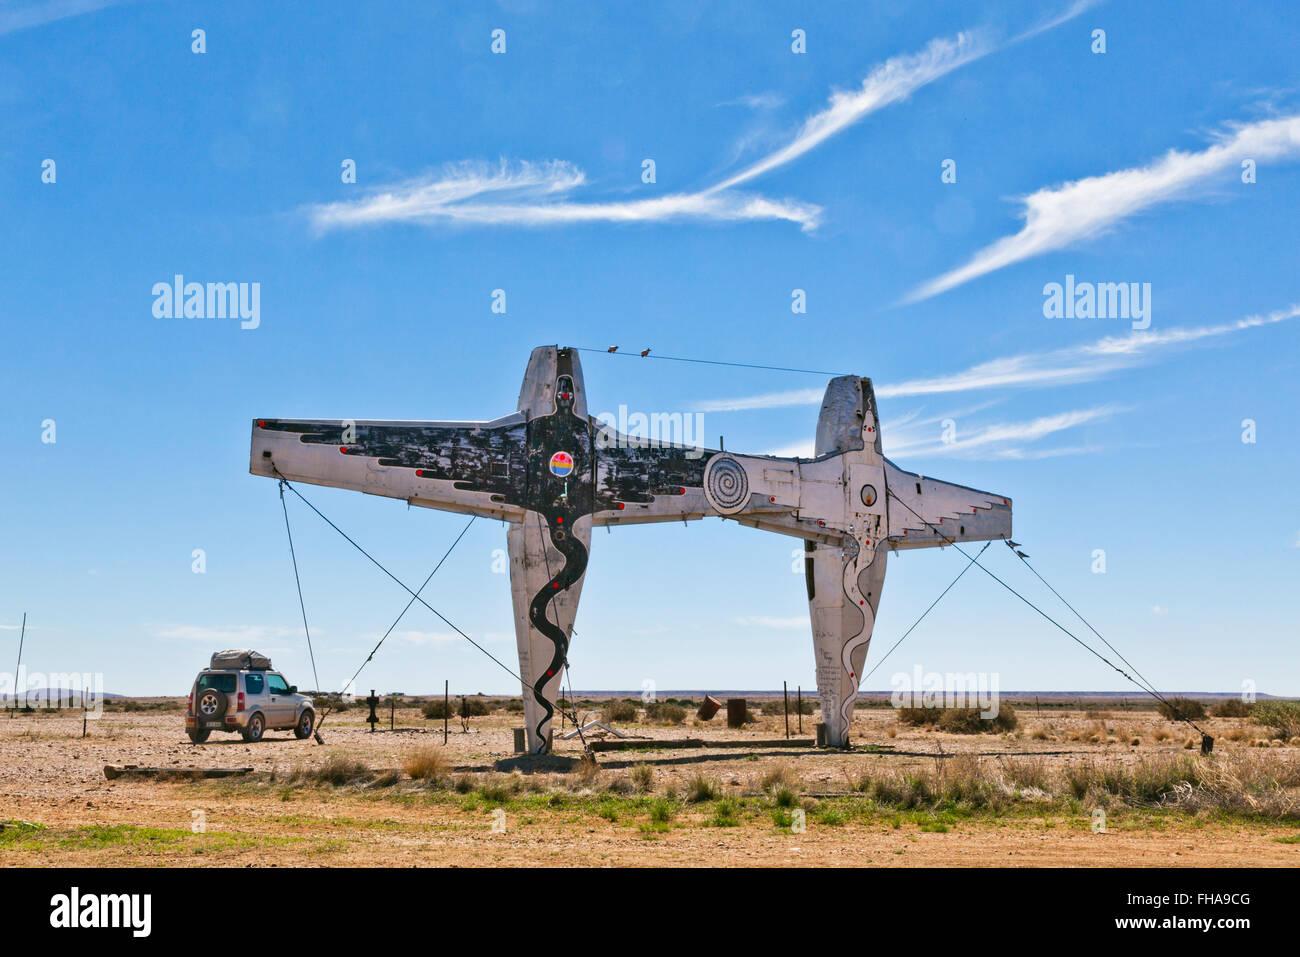 Parc de sculptures, Mutonia Alberrie Creek, Oodnadatta Track, 'avion' Henge instalations par Robin 'Mutoid' Photo Stock